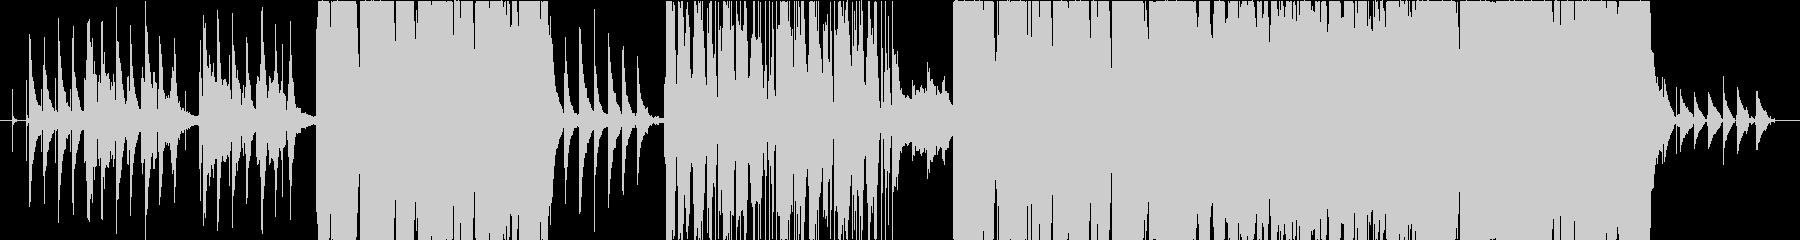 HEX (Chicago Mix)の未再生の波形